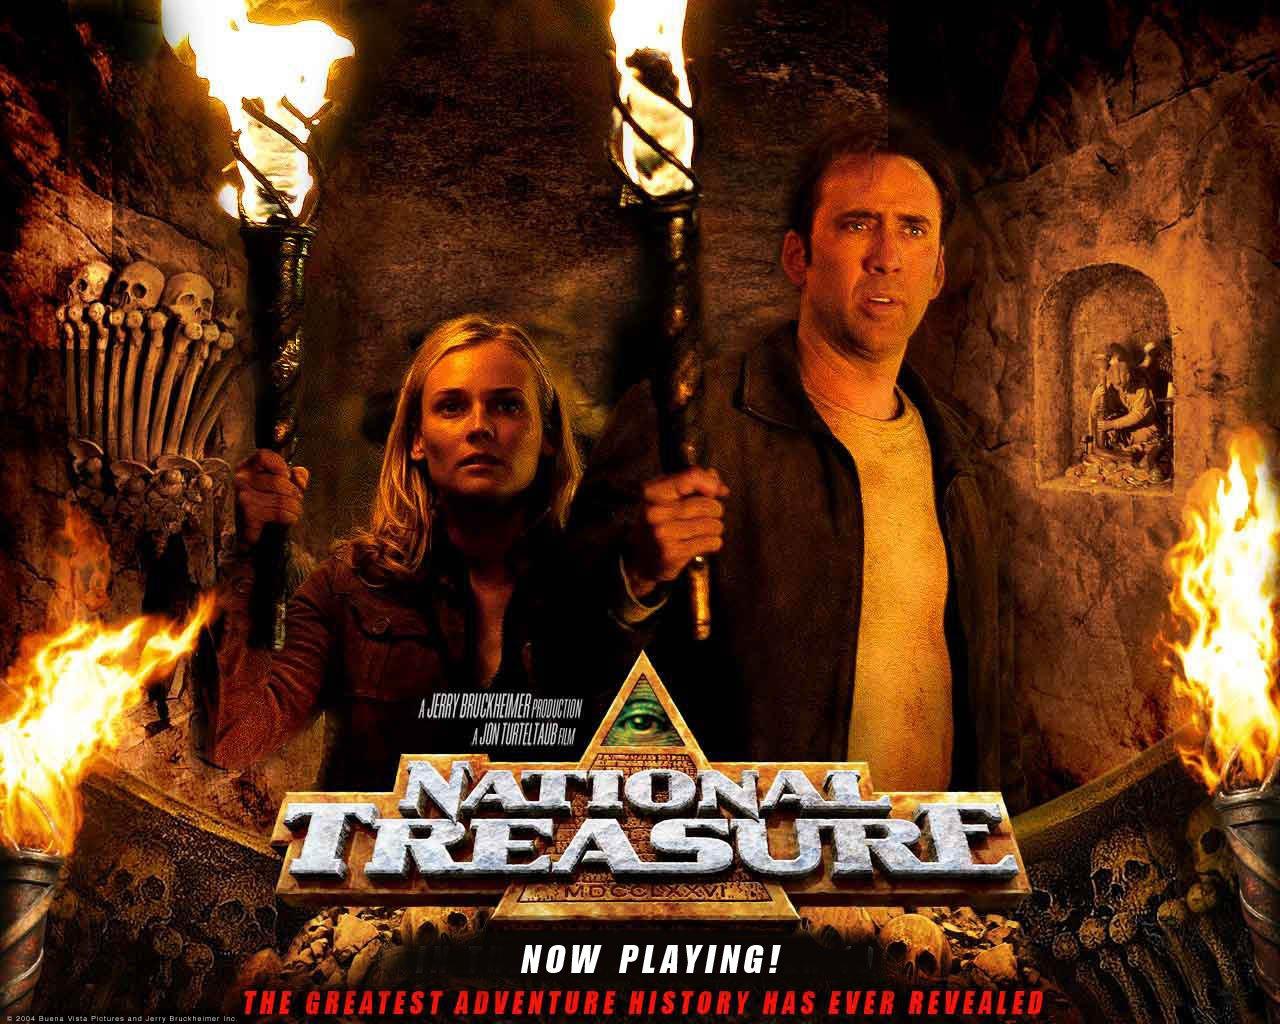 nicolas-cage-national-treasure-book-of-secrets-poster-2.jpg